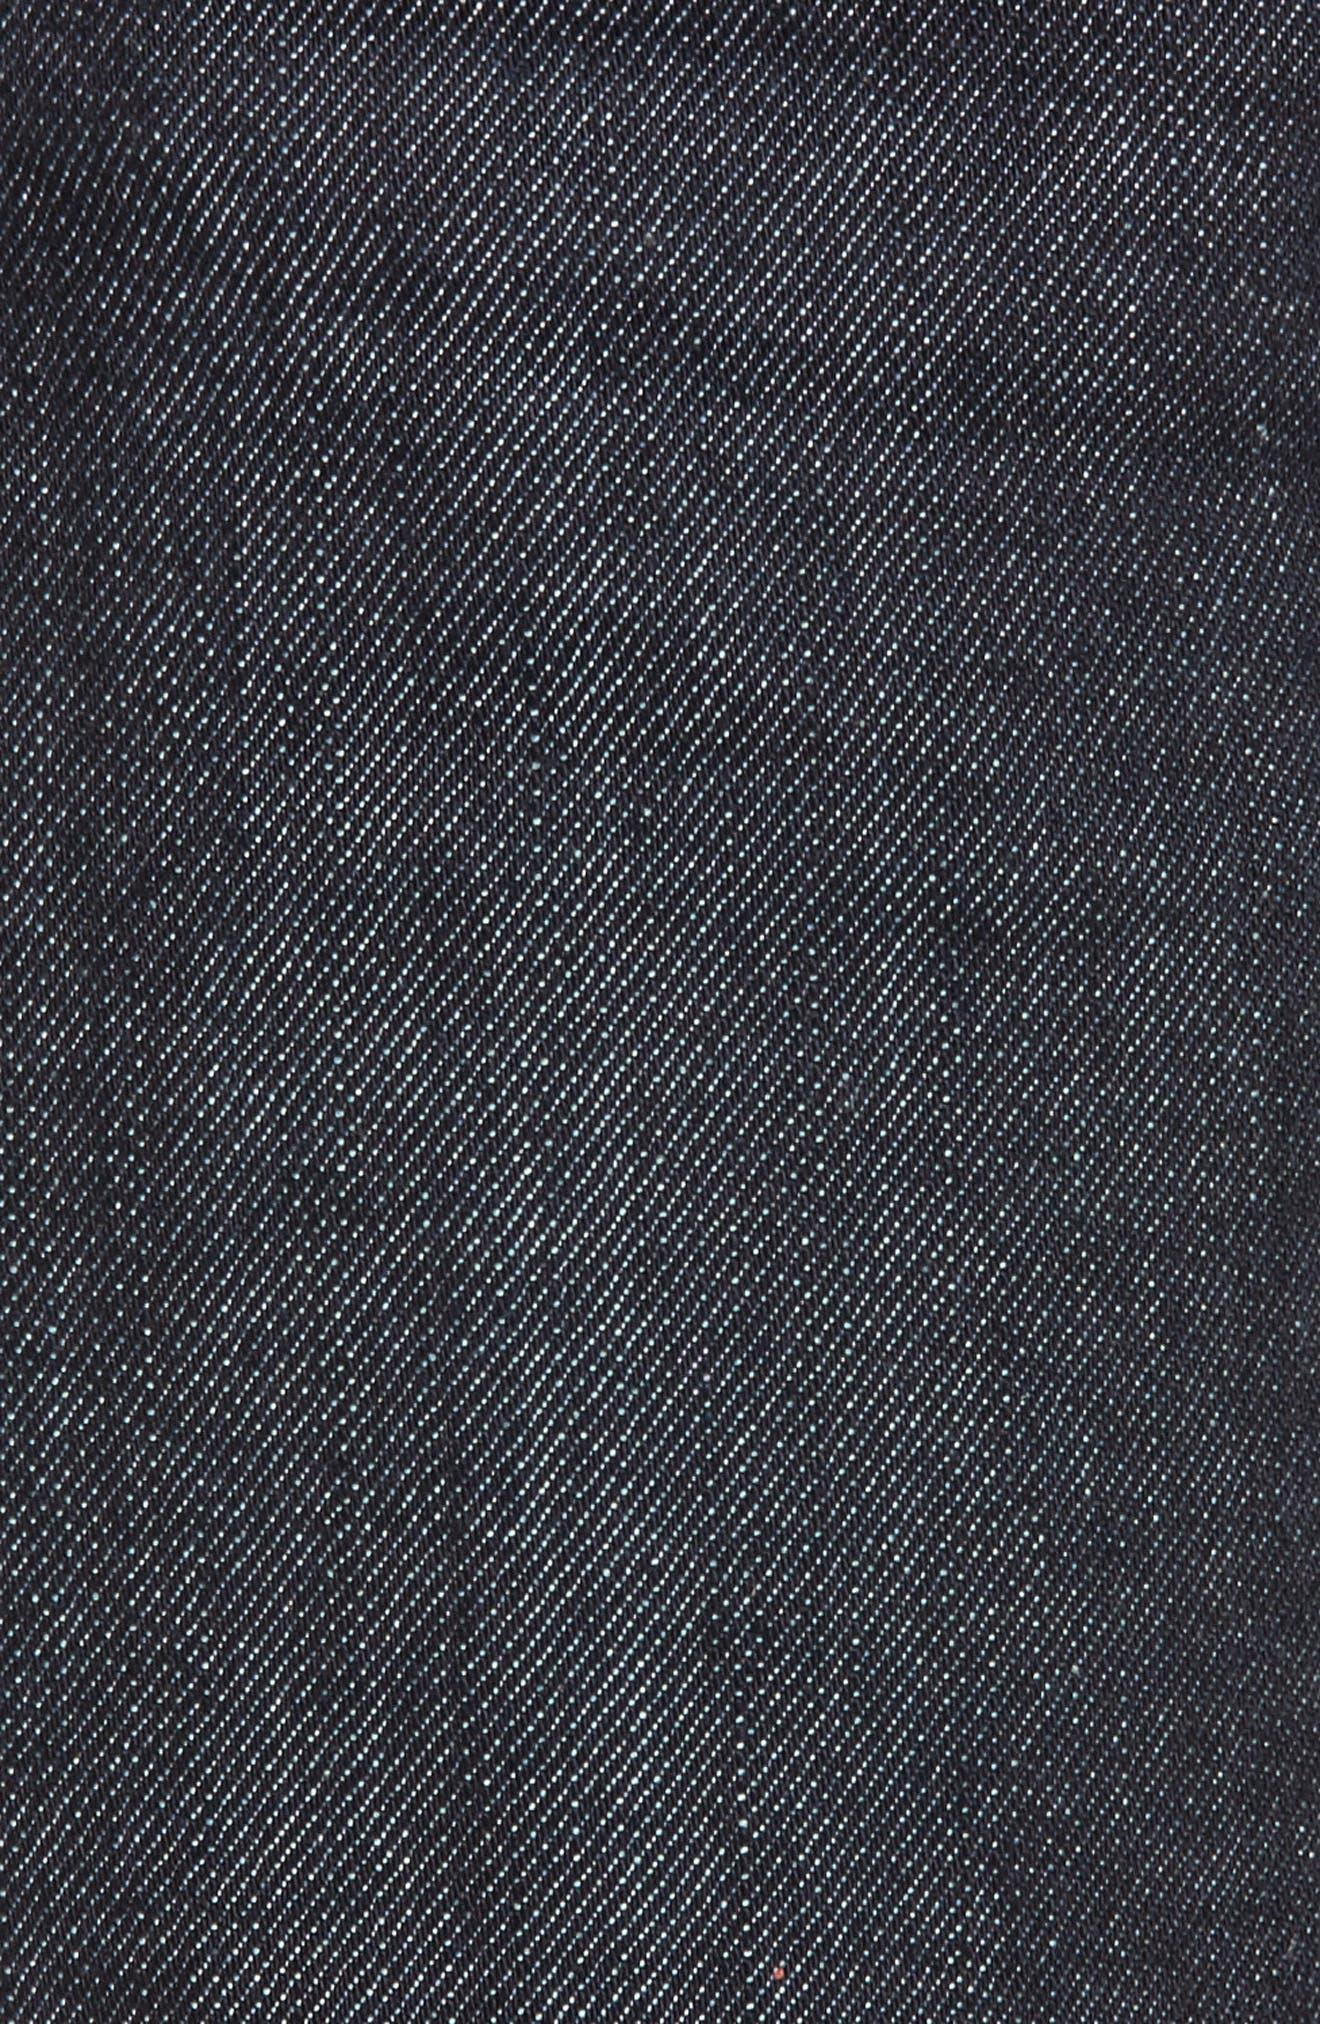 Alternate Image 5  - Fidelity Denim Torino Slim Fit Jeans (Akiba)